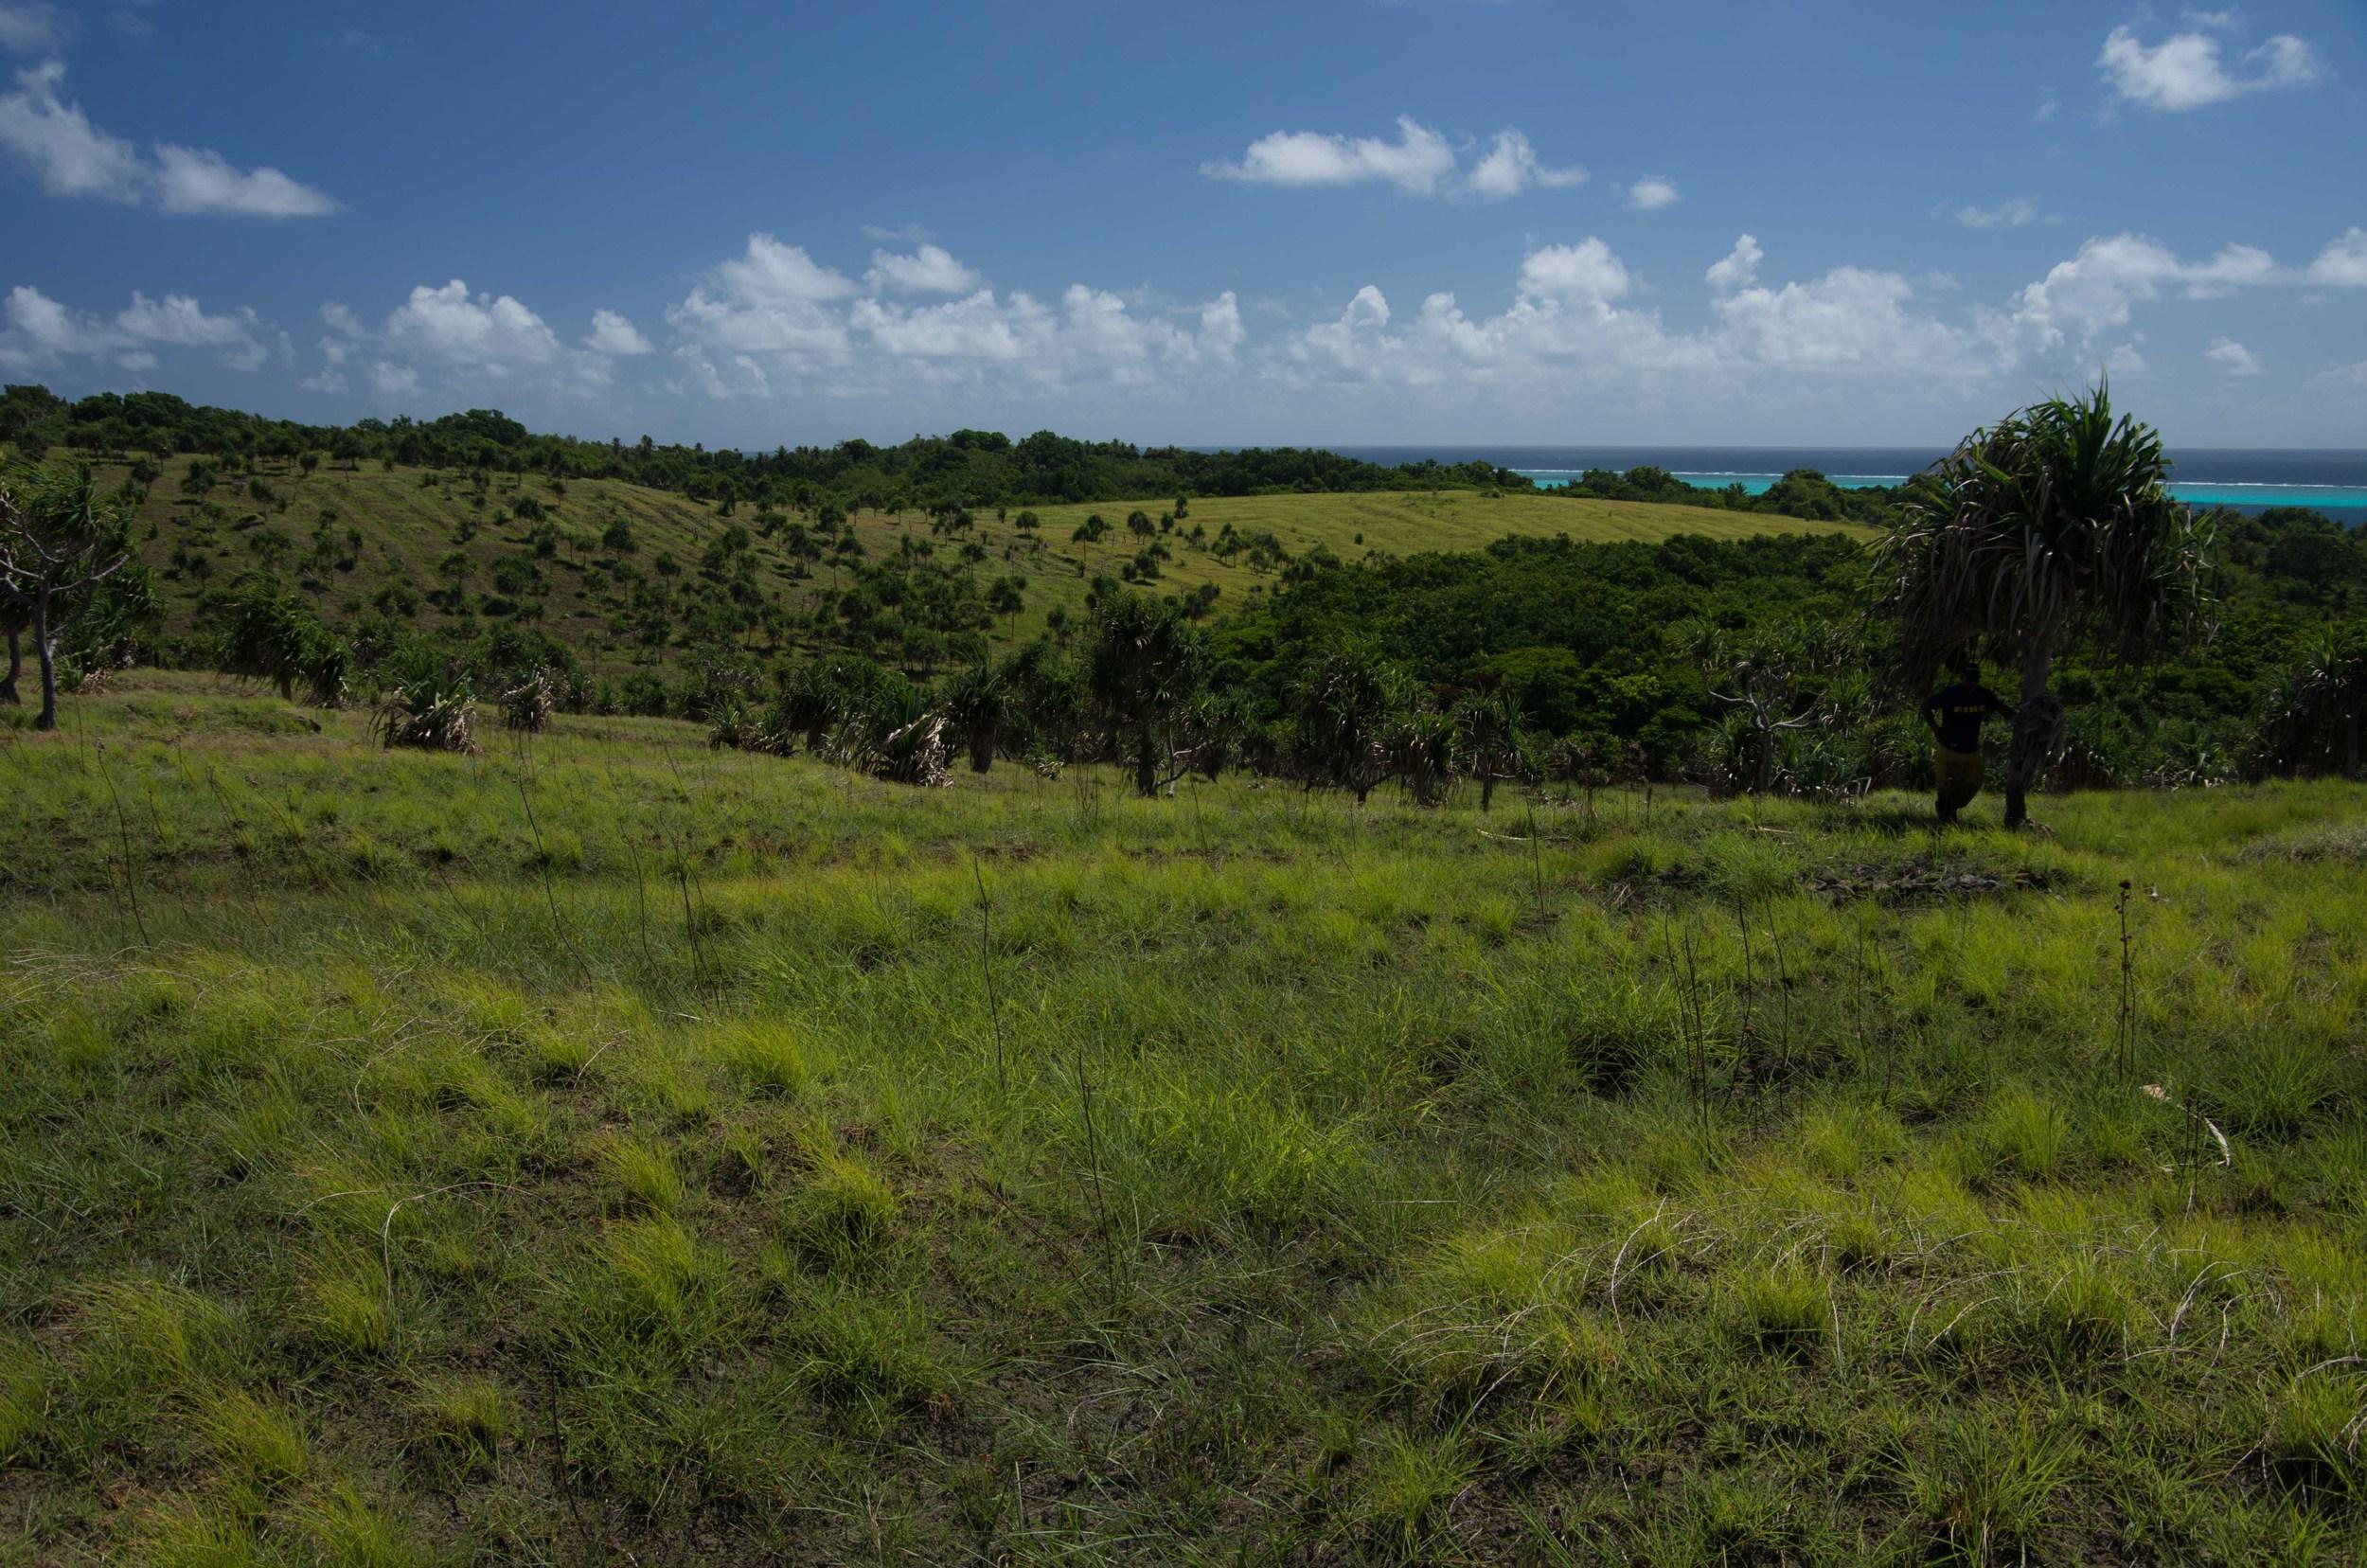 savanna-forest mosaic on Yap